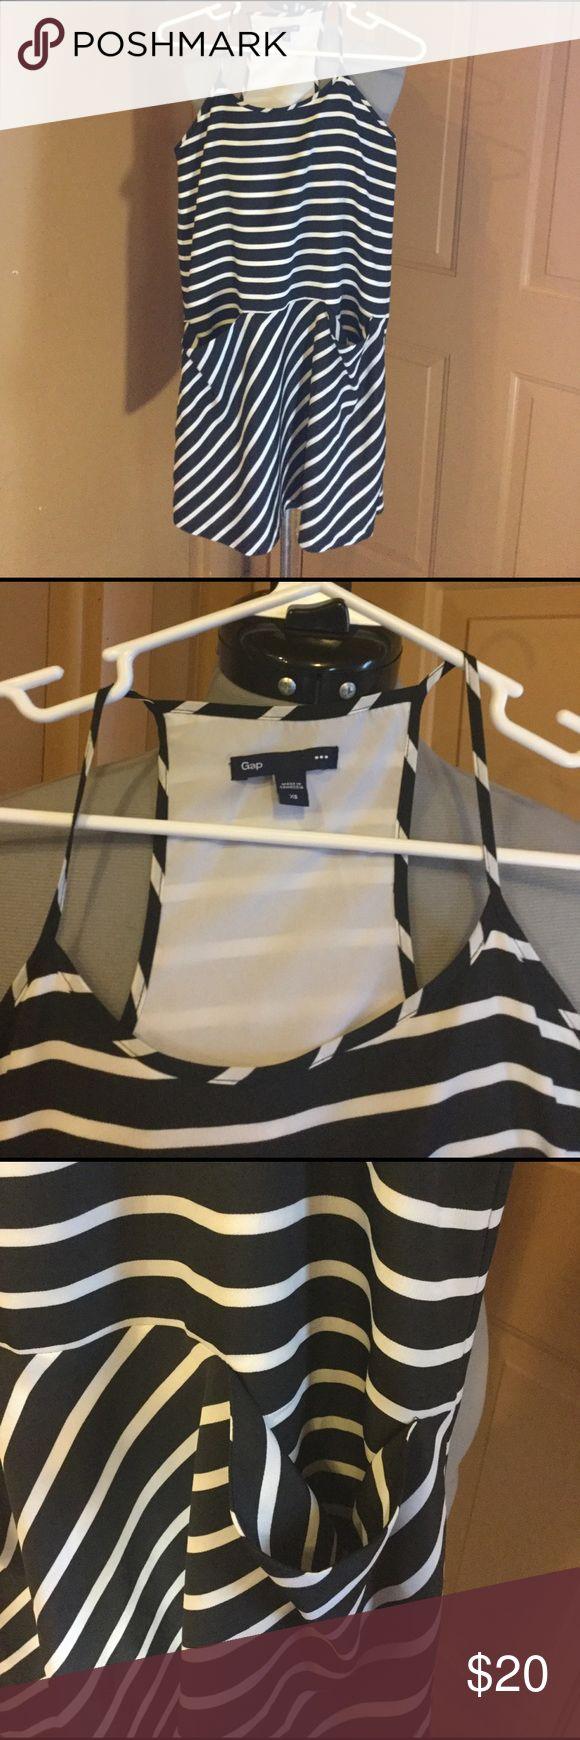 "Gap dress size Extra Small Gap ""Navy Stripe jet shirt tank dress"" size Extra Small. The dress has pockets. Smoke free home and dog mom. GAP Dresses"